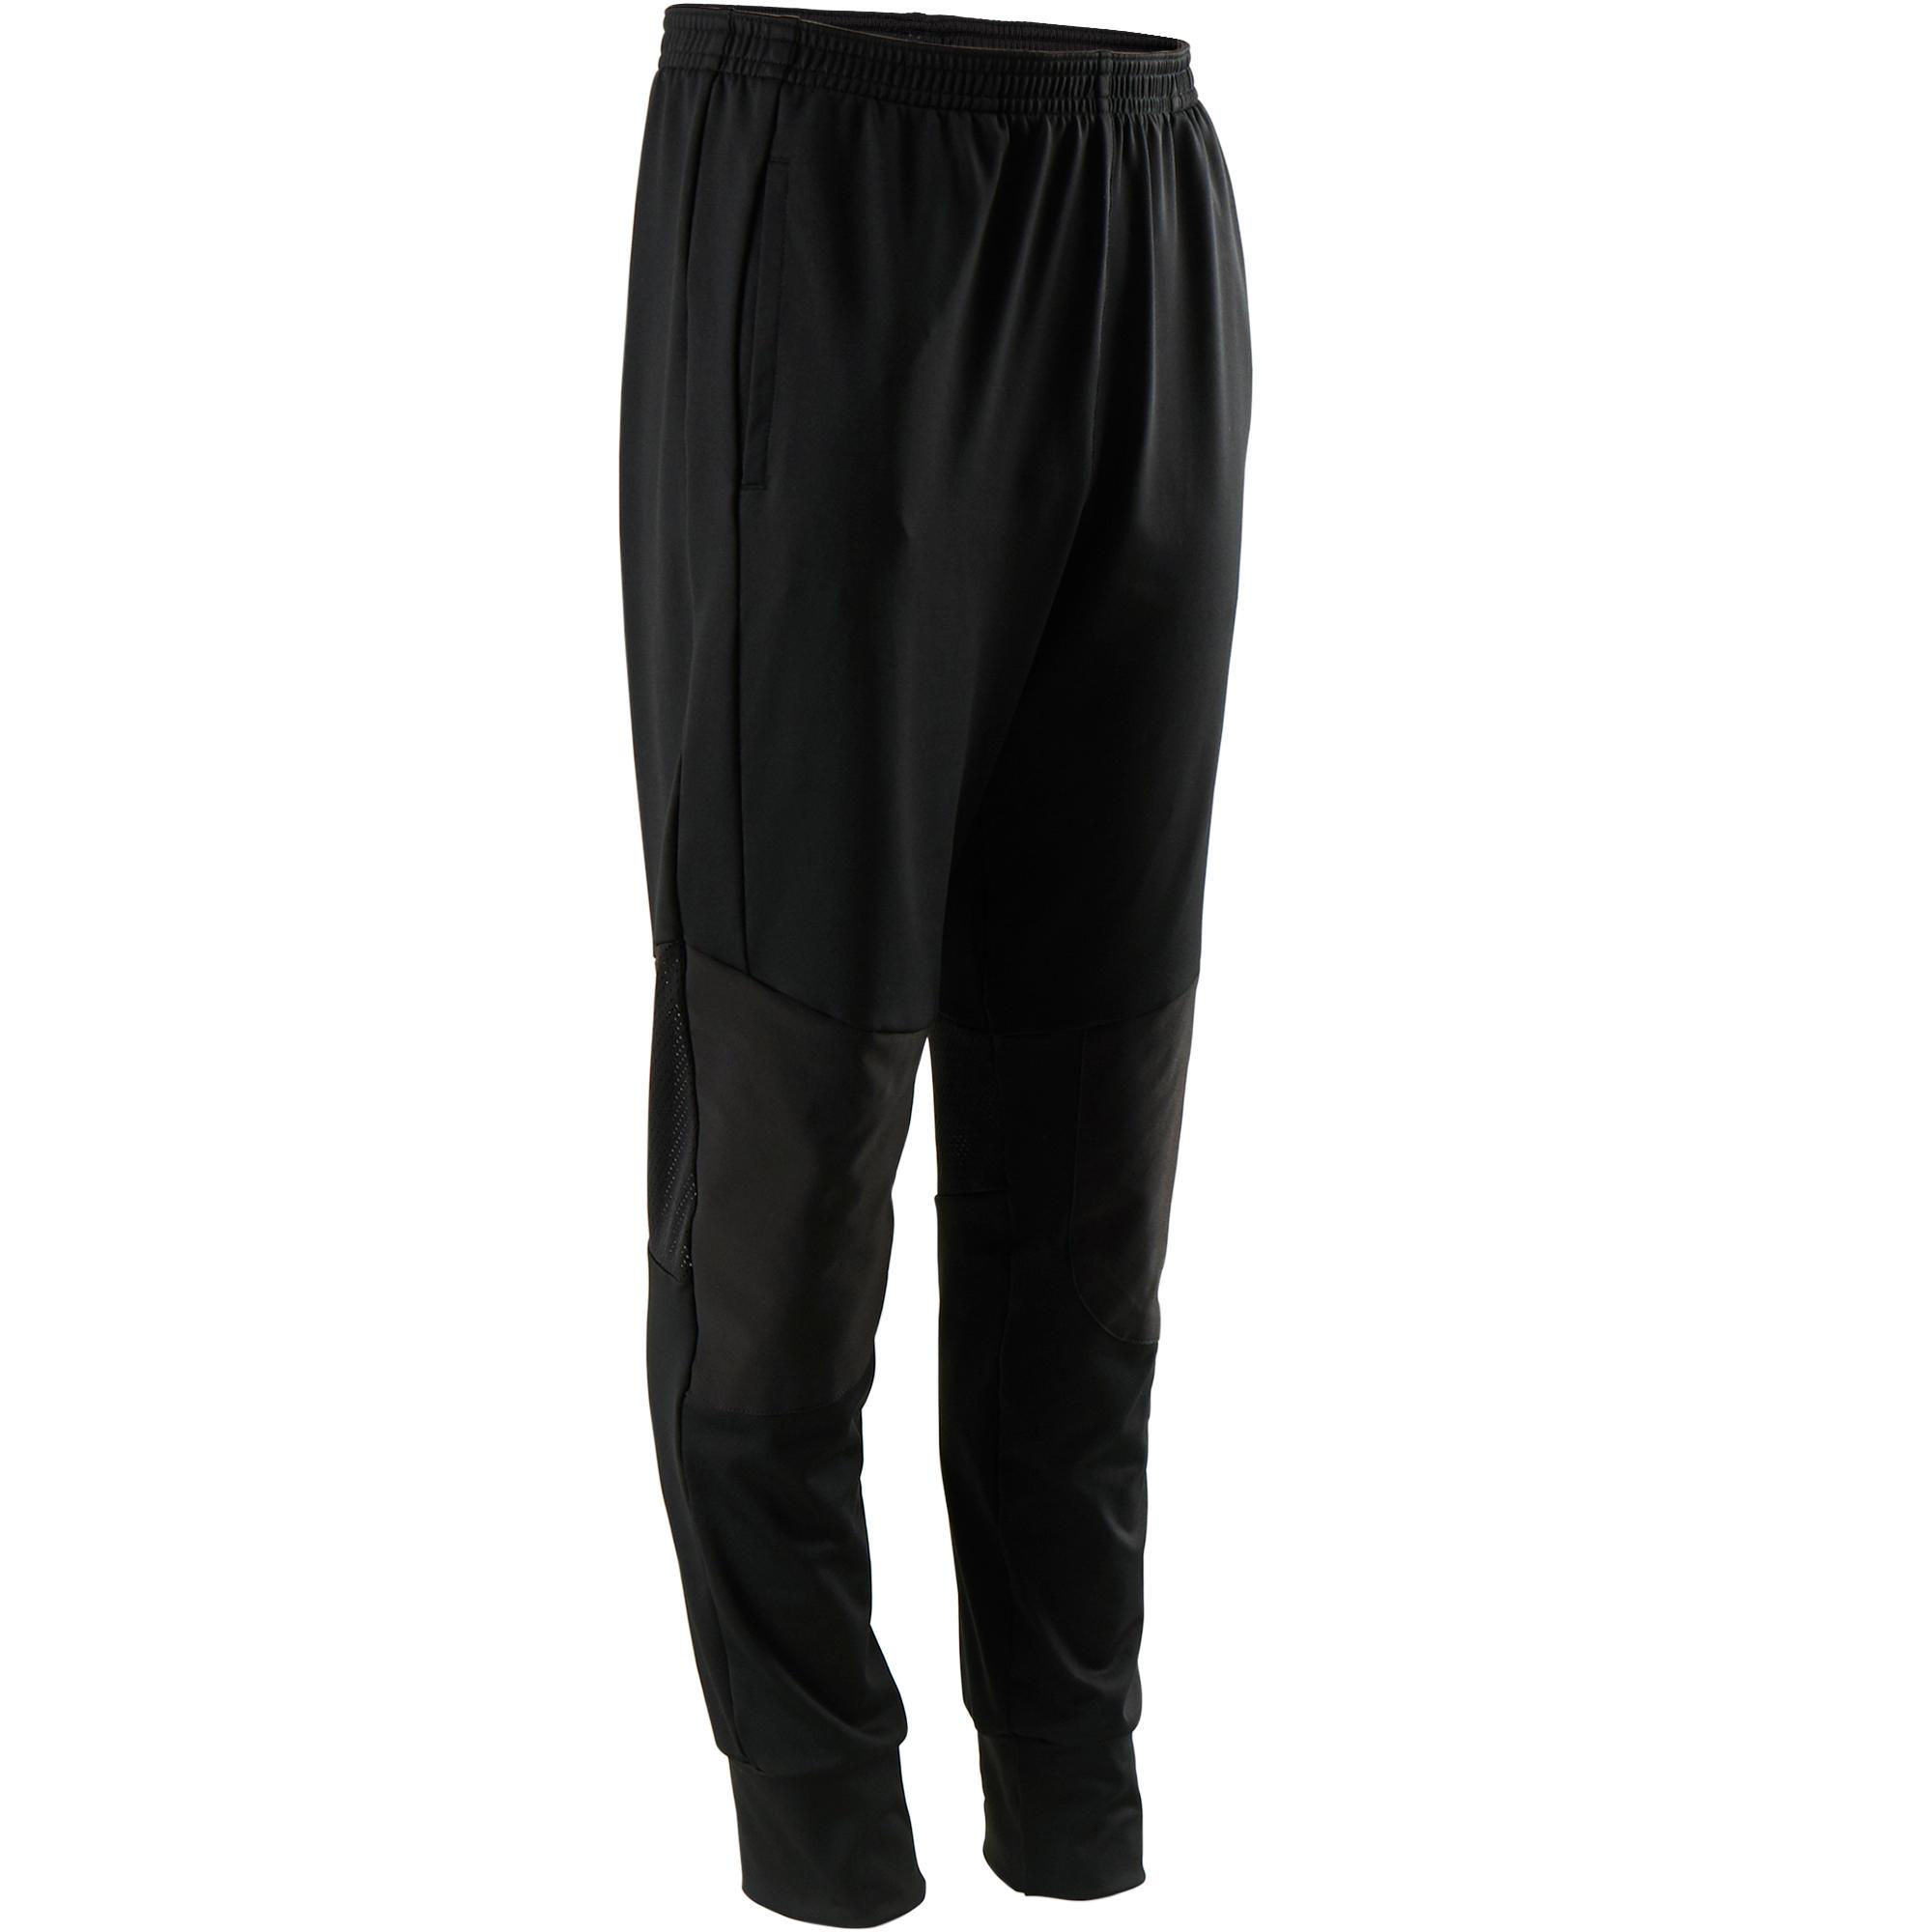 Pantalón sintético transpirable resistente slim ligero S500 niño GIMNASIA JR neg